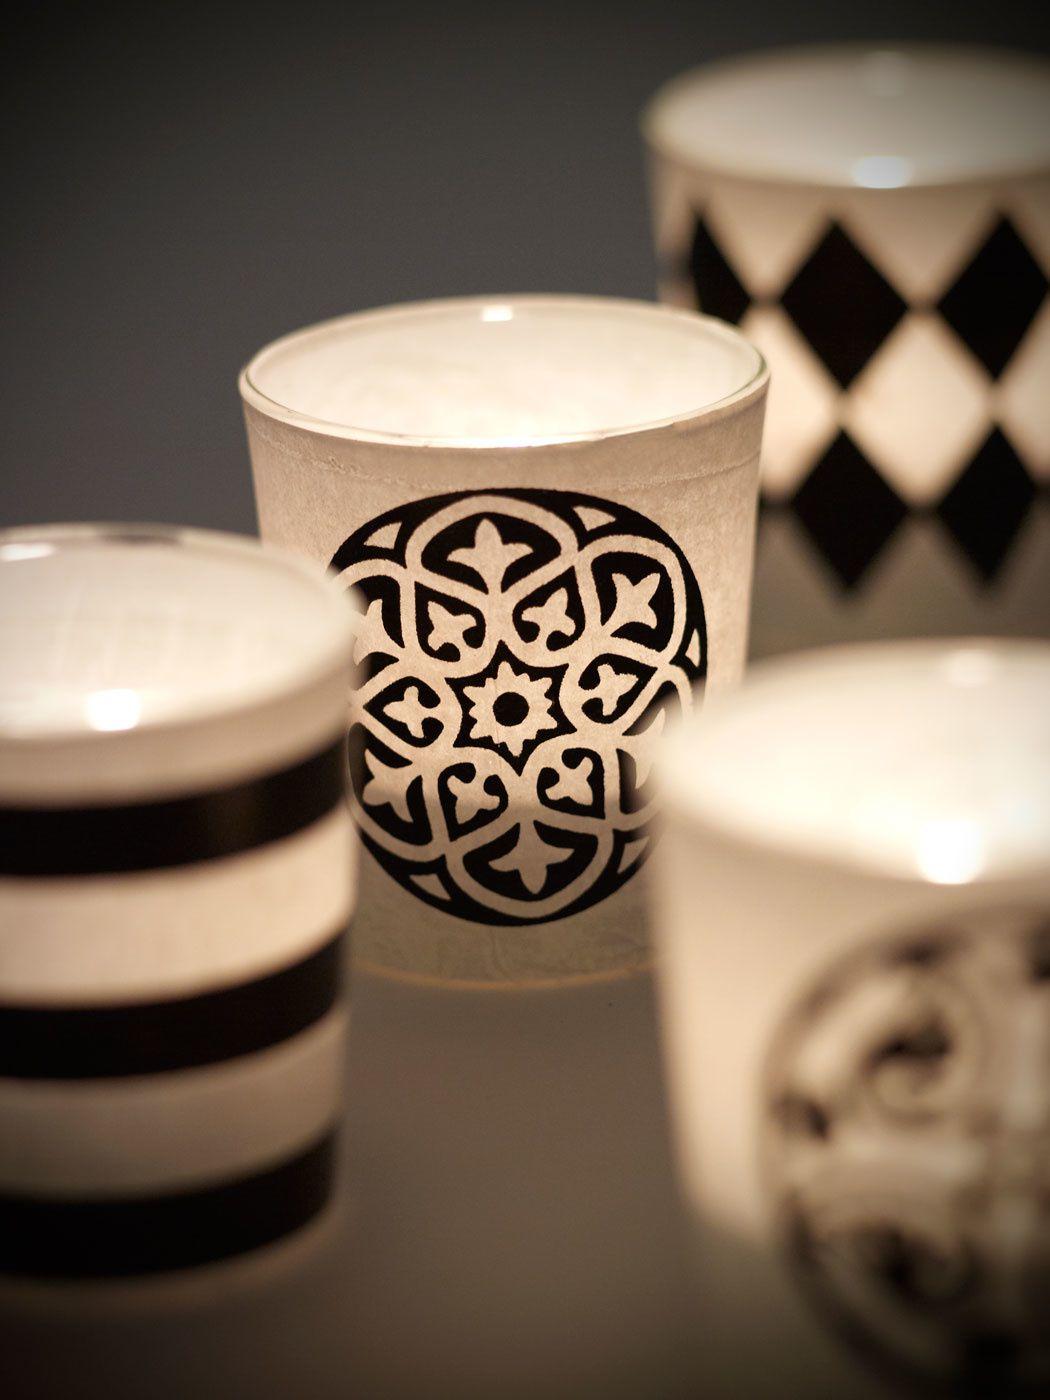 Craquage total sur la collection black and white Serax